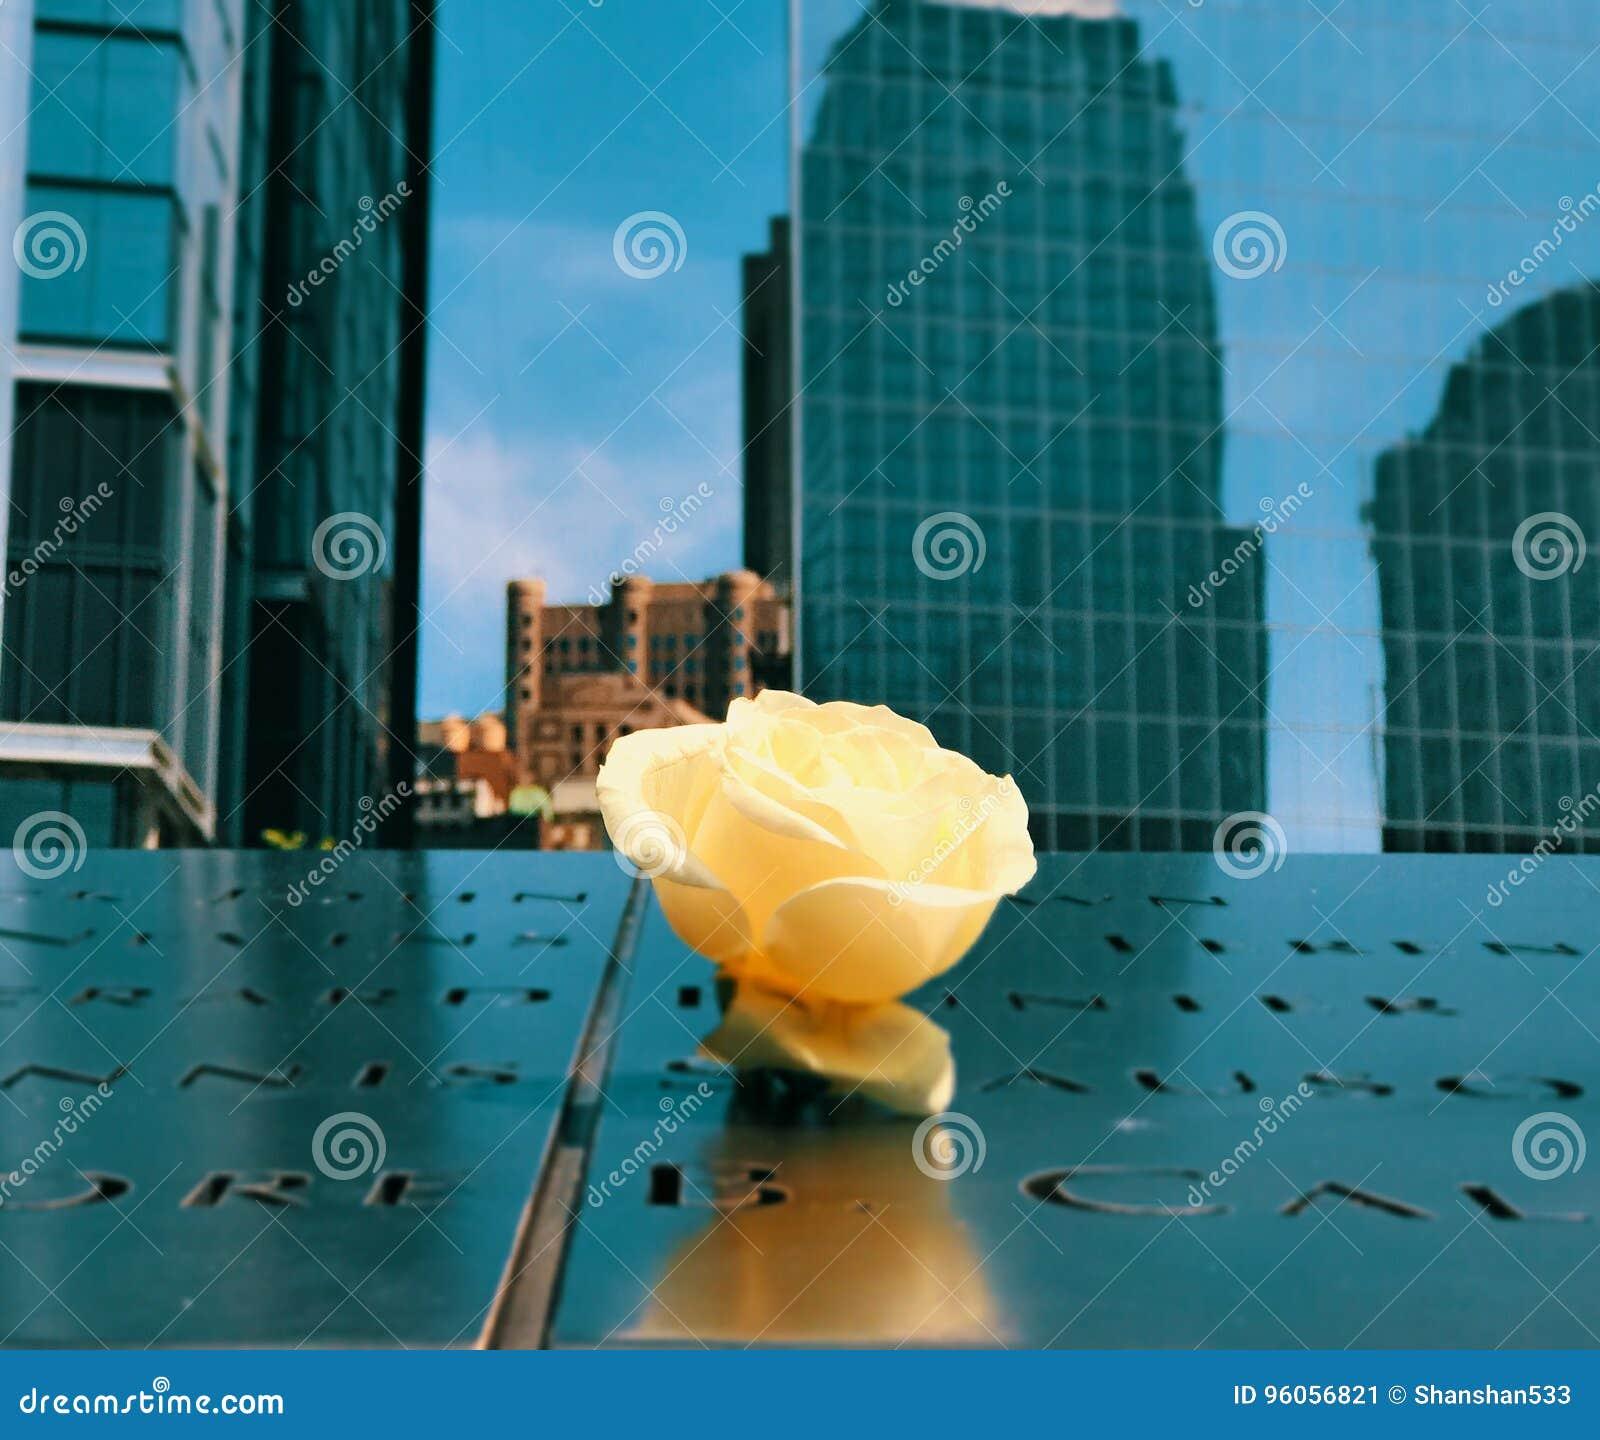 Rose Ground Zero simple